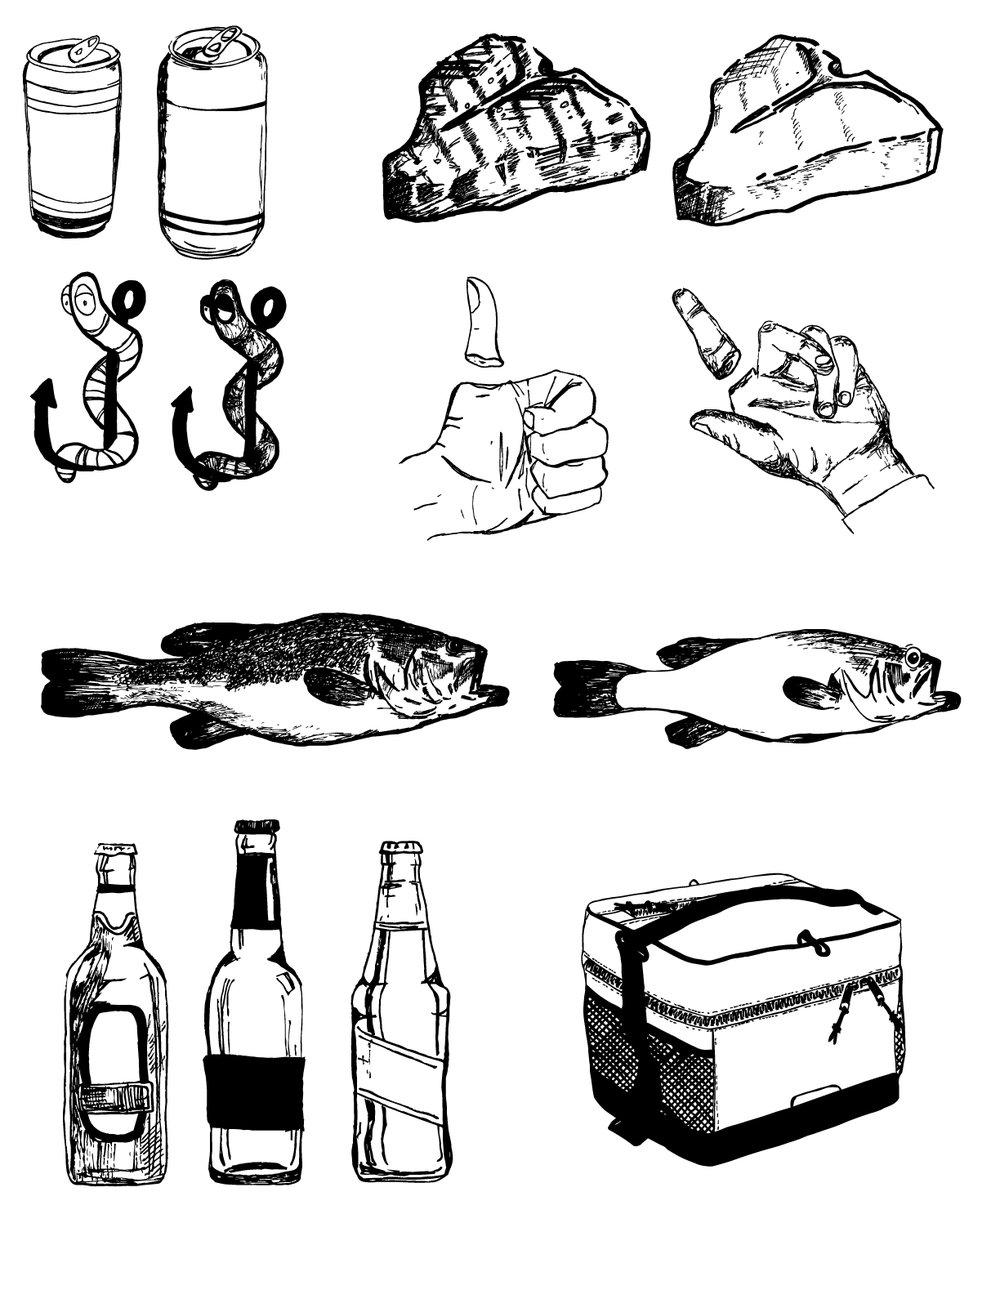 PACKIT-2016-Can-Cooler-Drawings.jpg